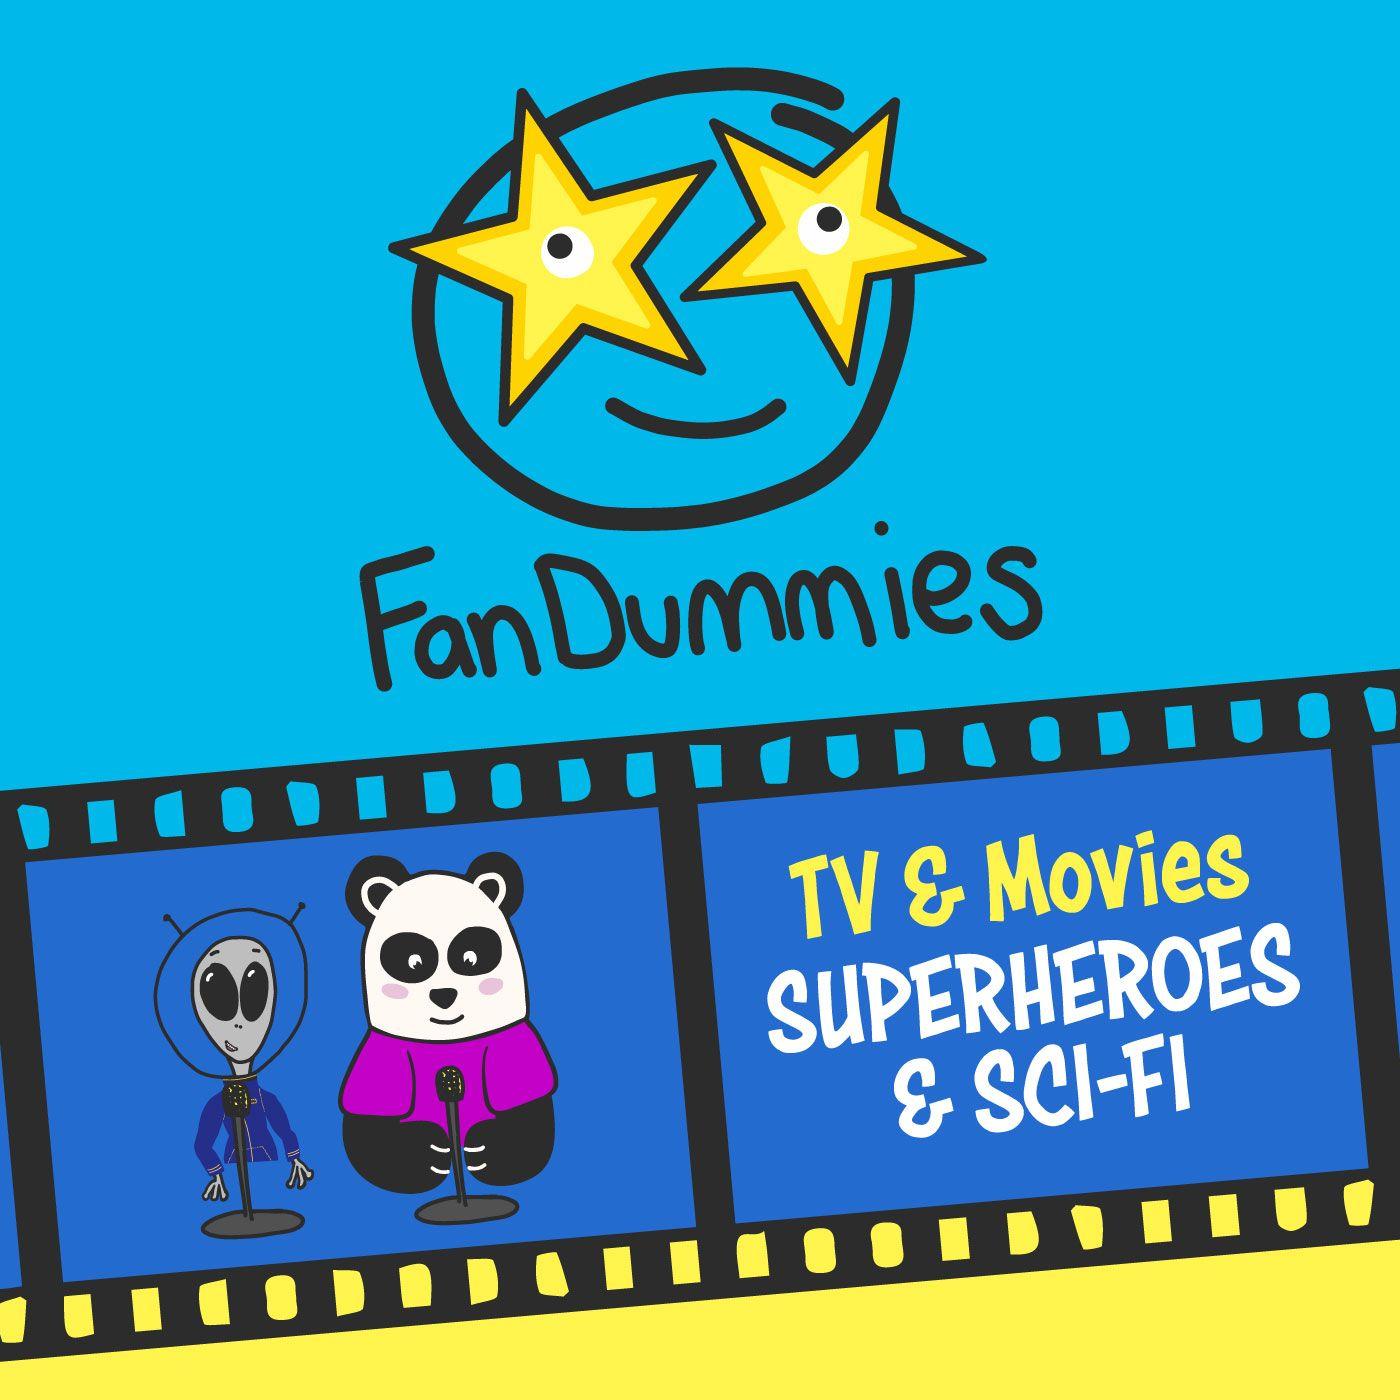 149. FanDummies Guide to the Galaxy 9/2021 edition - Shang Chi, Y The Last Man, Star Wars Visions, Foundation, Disney Gallery Mandalorian